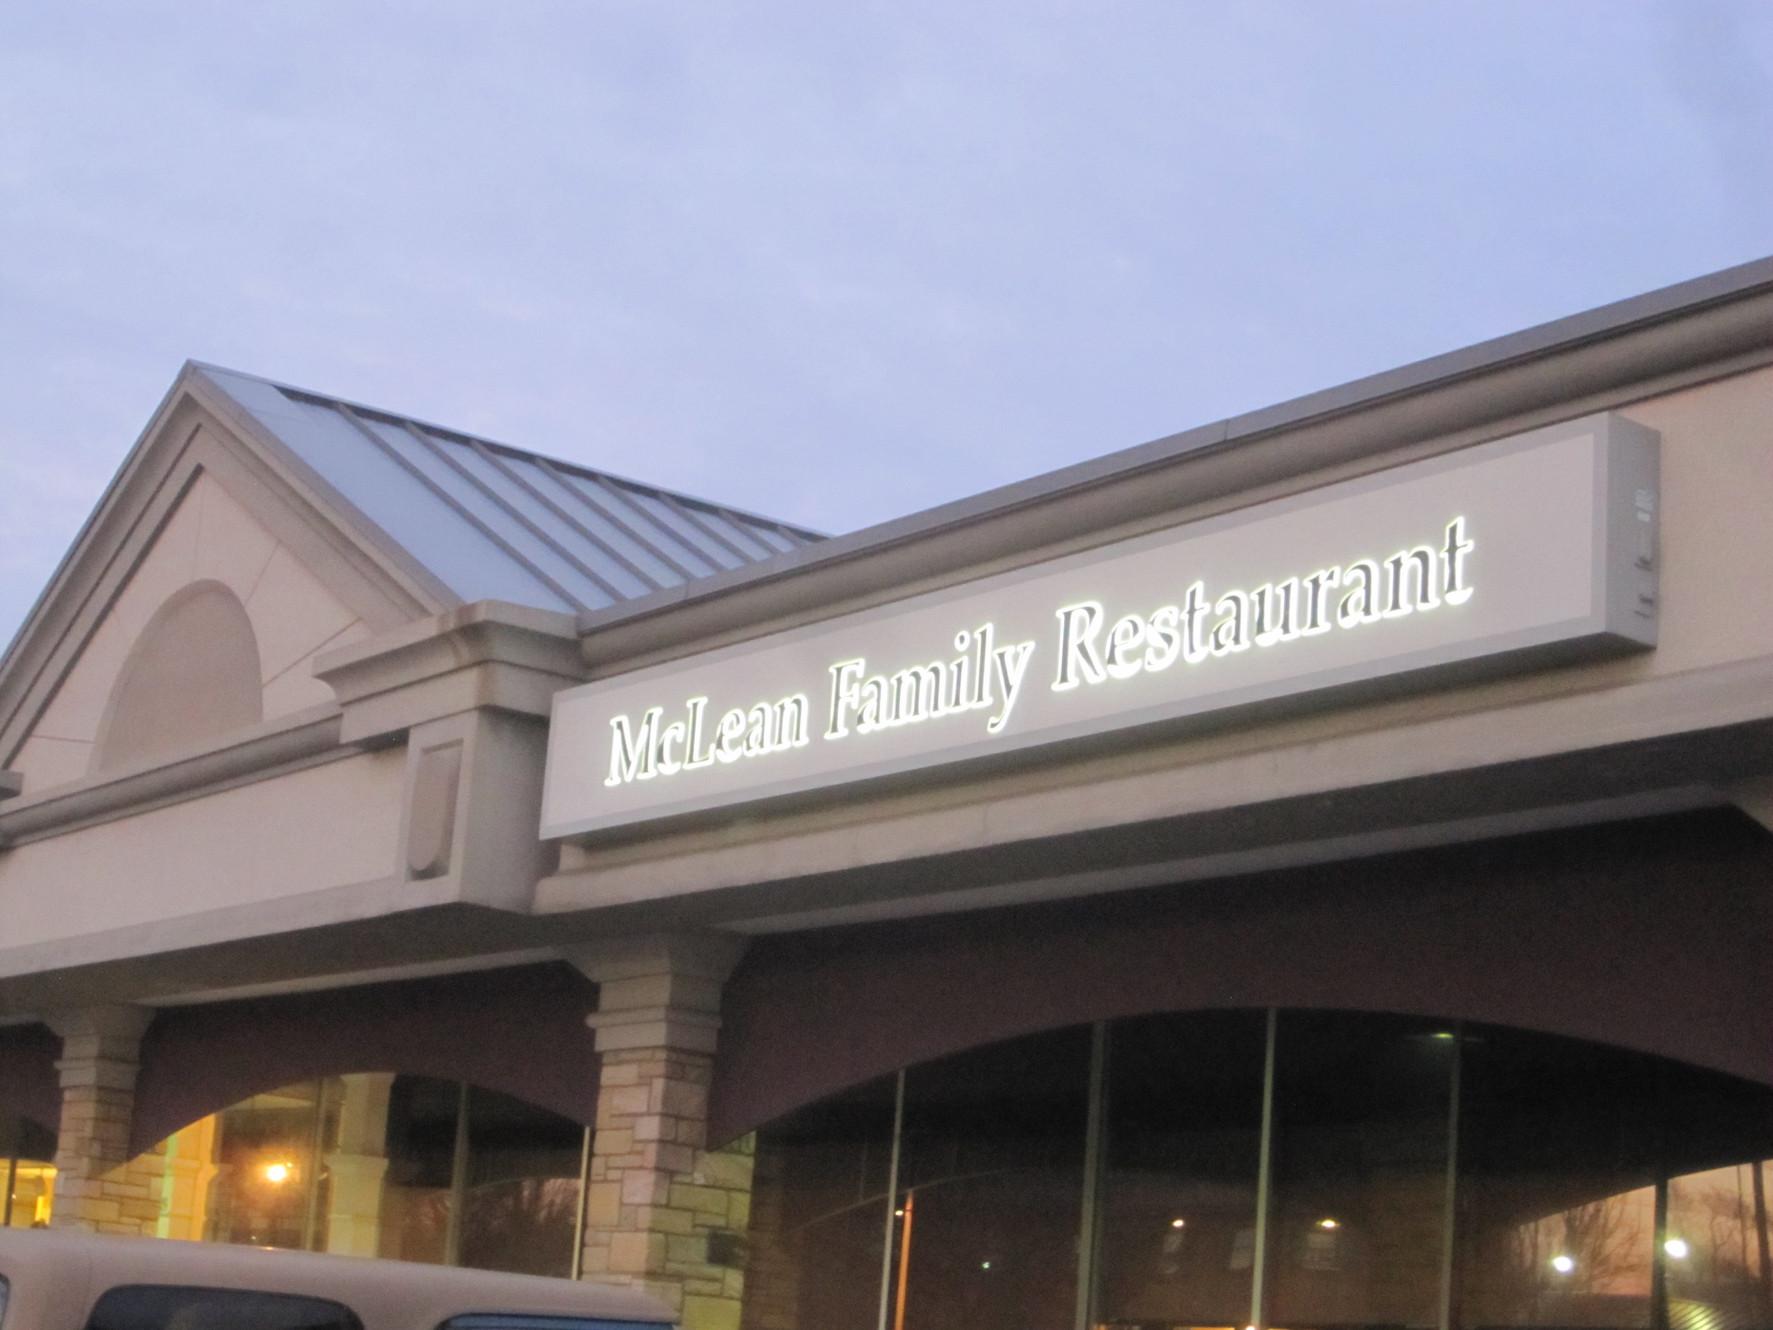 Mclean Family Restaurant Mclean Va